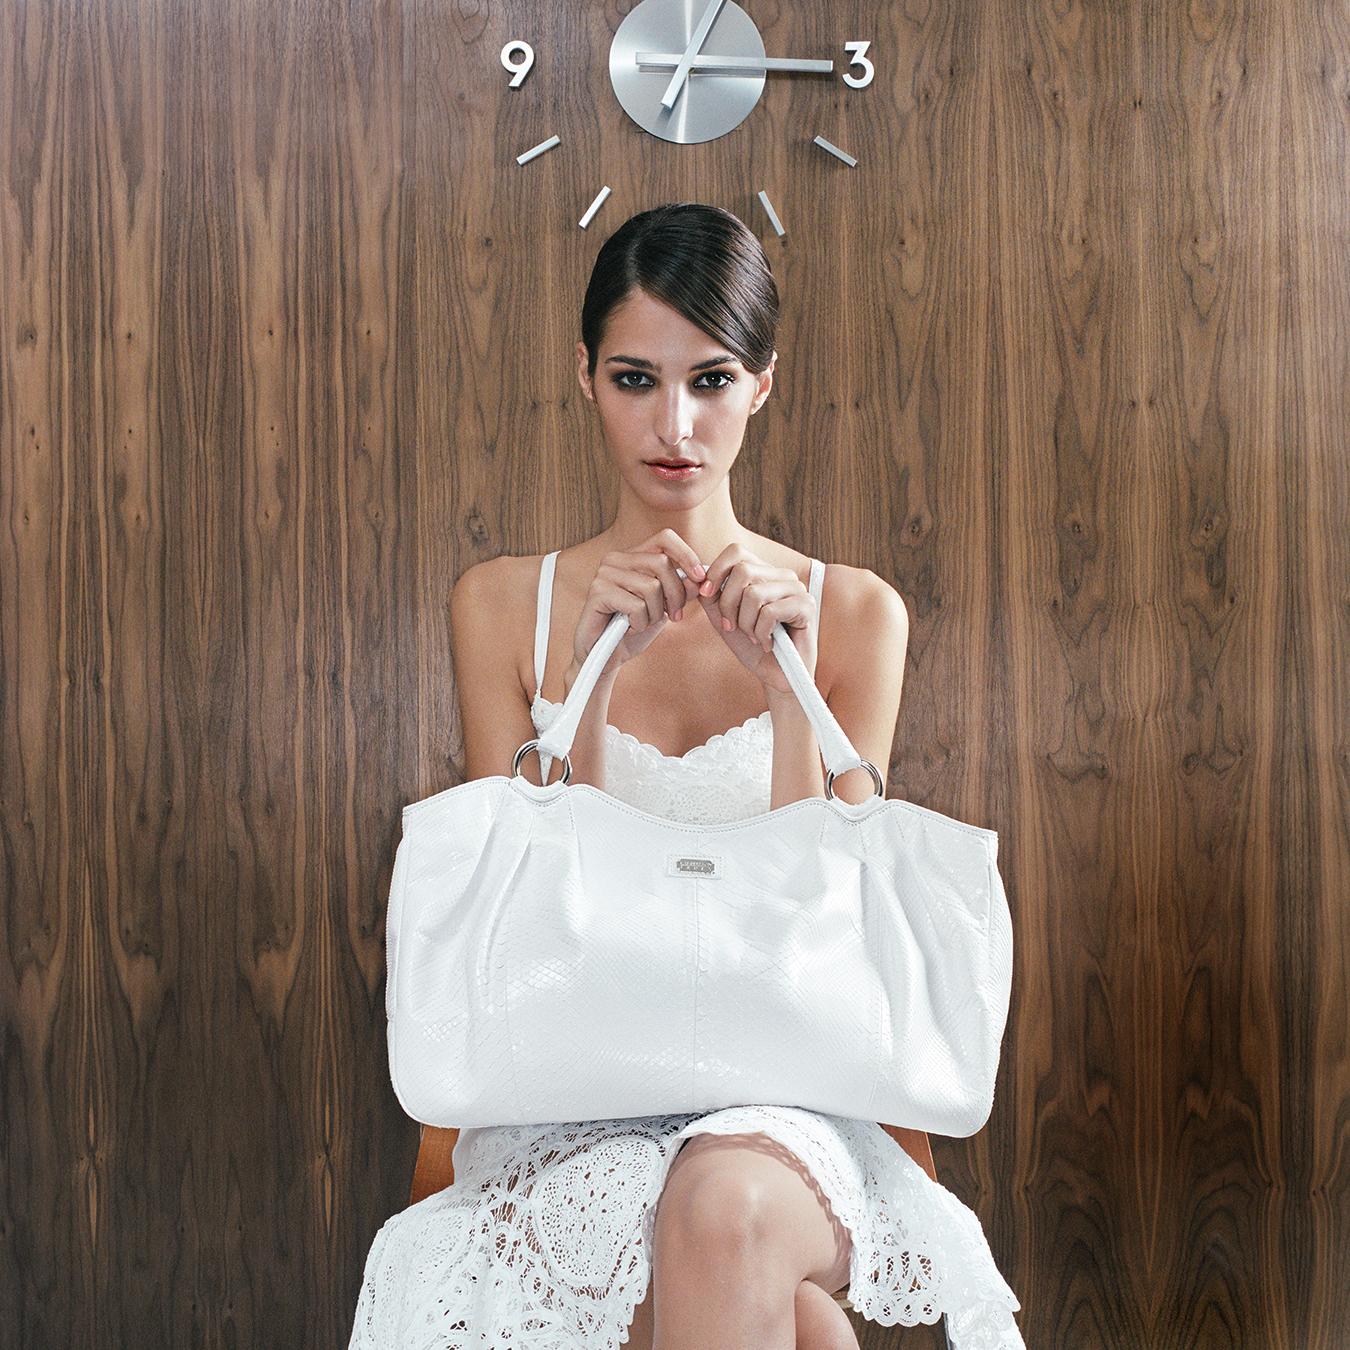 Tony_Ward_fashion_photography_Neiman_Marcus_handbags_catalogue_location_Palm_Springs_California_model_Emina_Cunmulaj_white_bag_dress